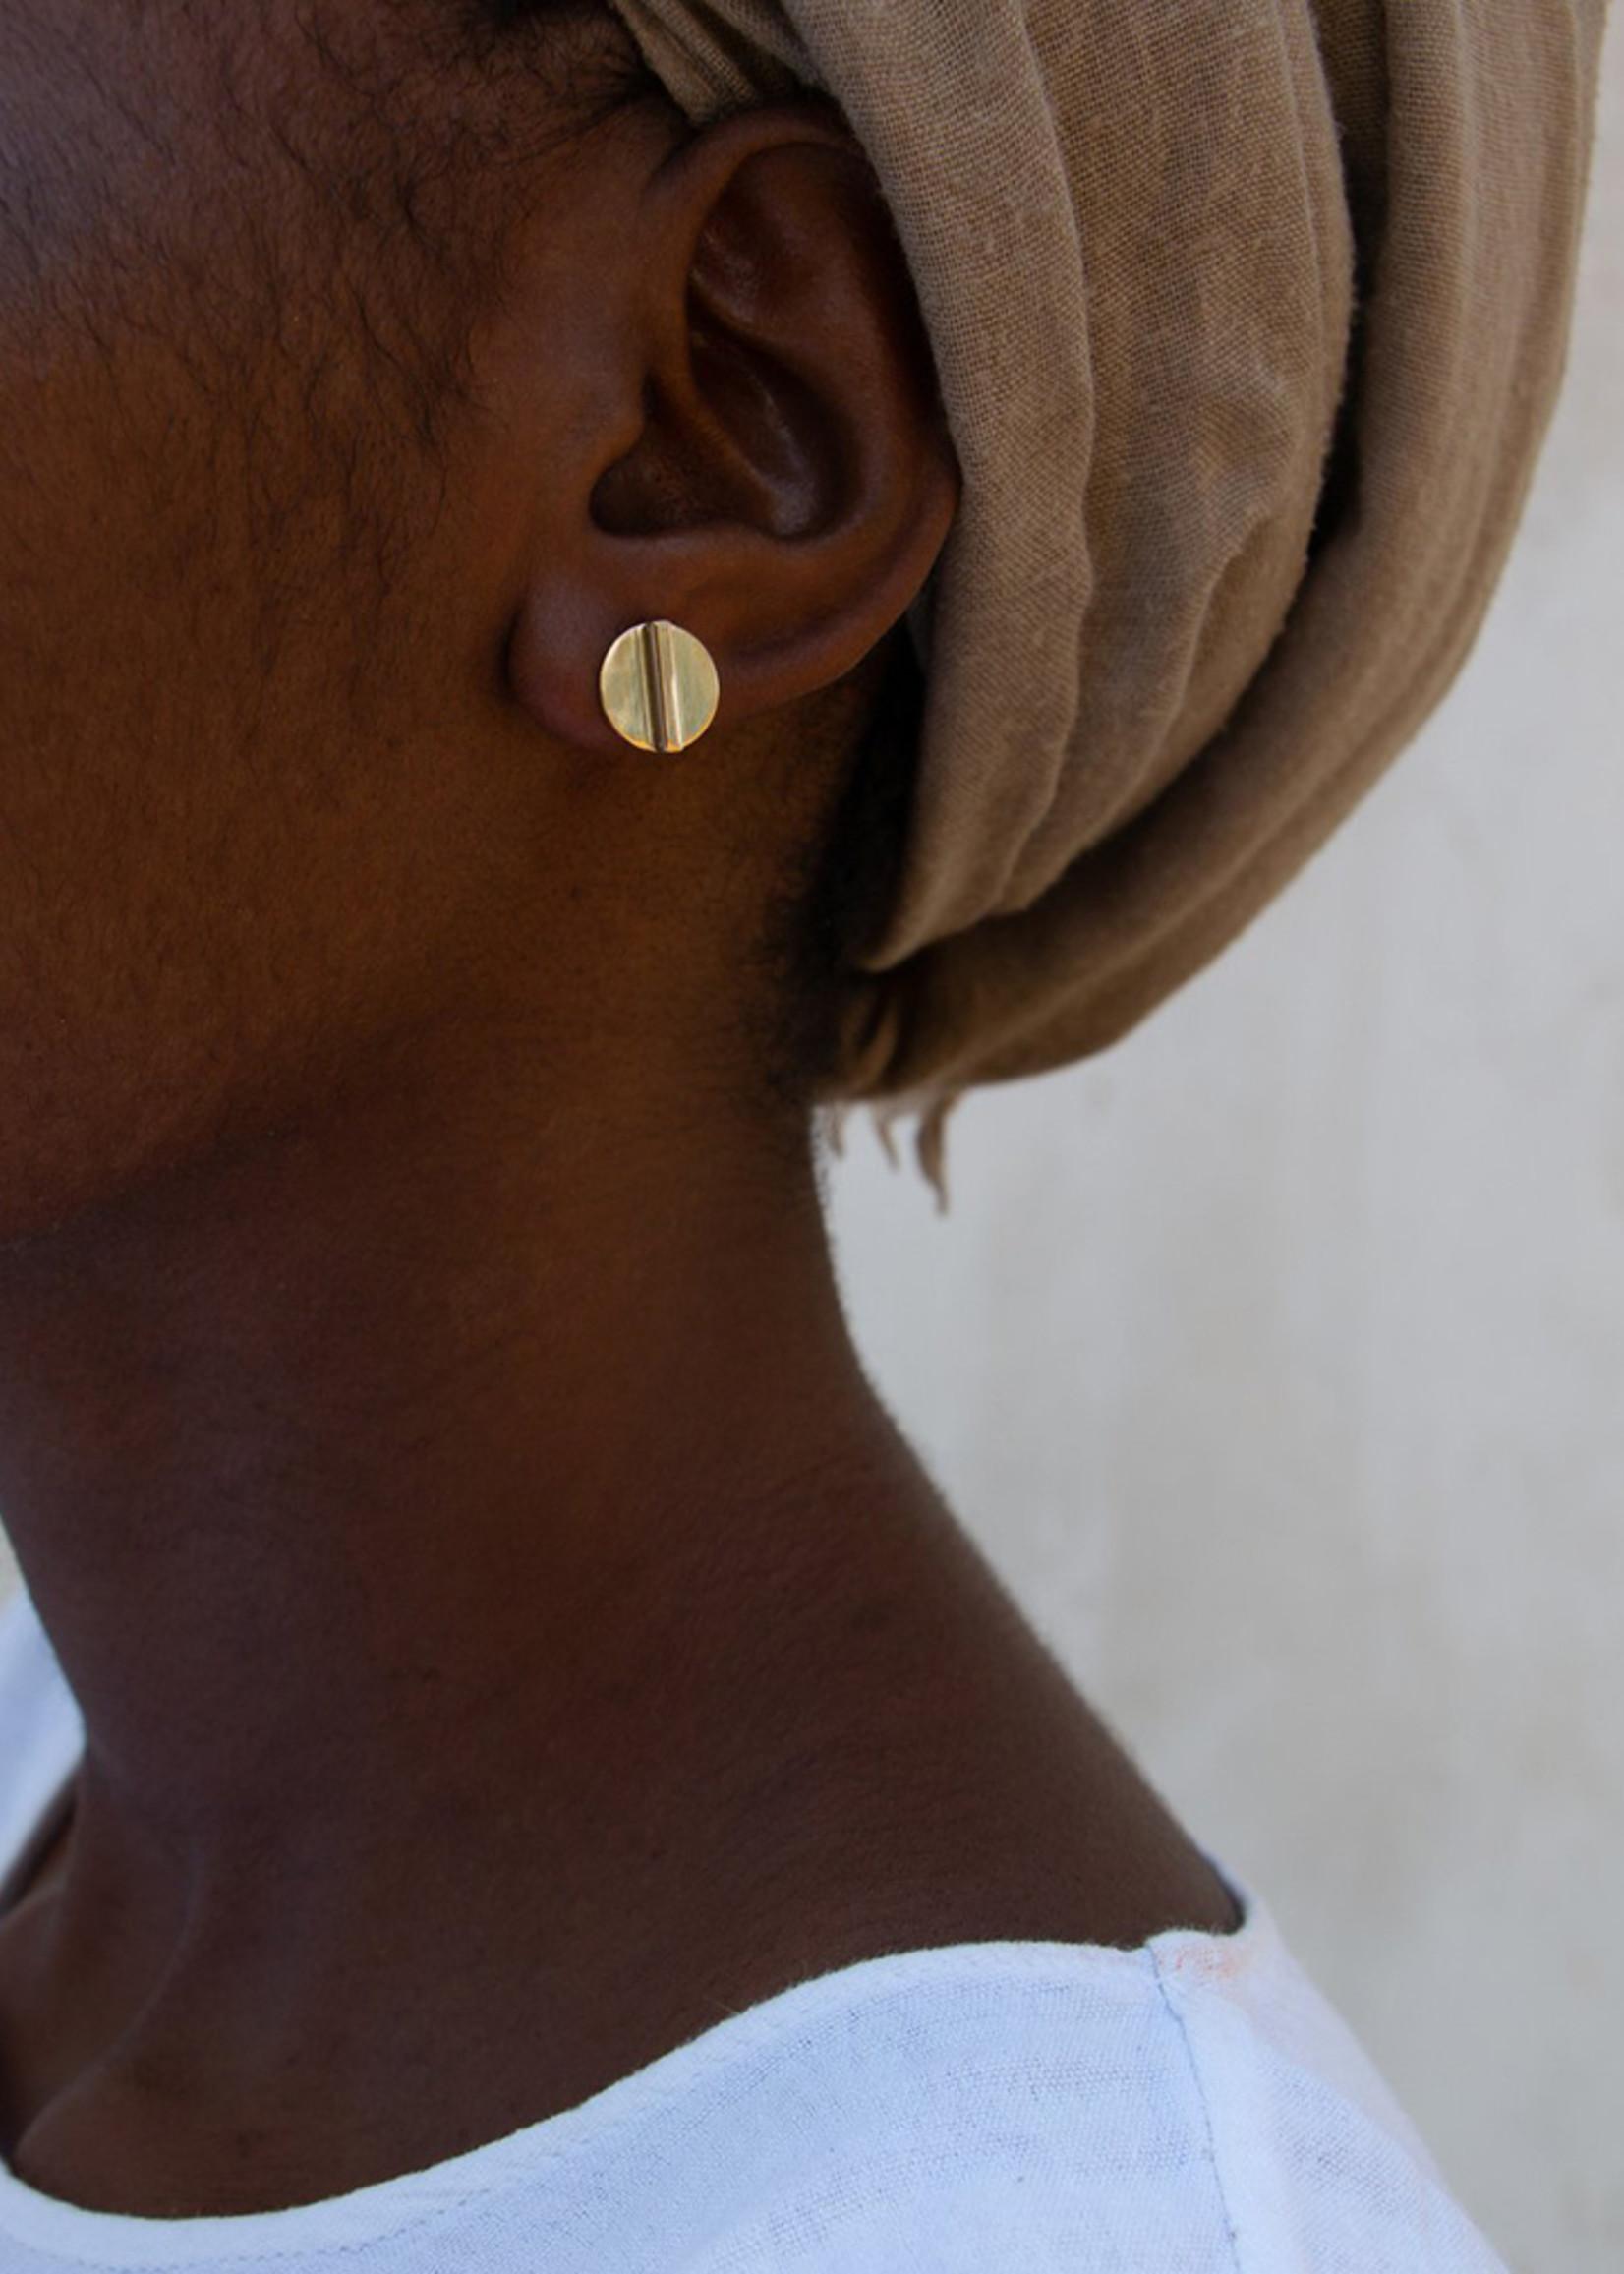 YEWO Mbale Earrings